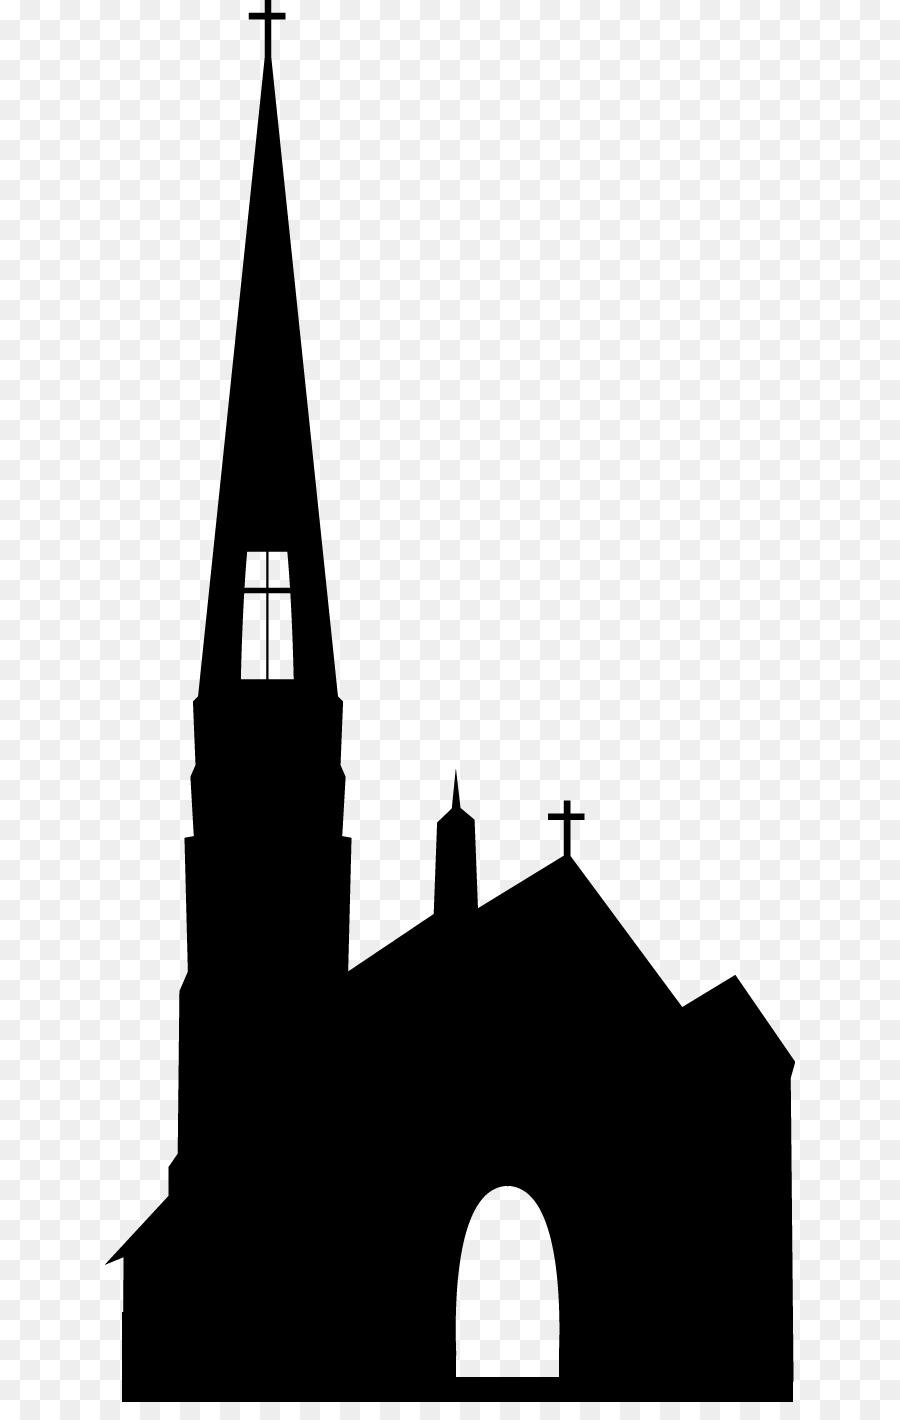 900x1420 Erqi Memorial Tower Silhouette Church